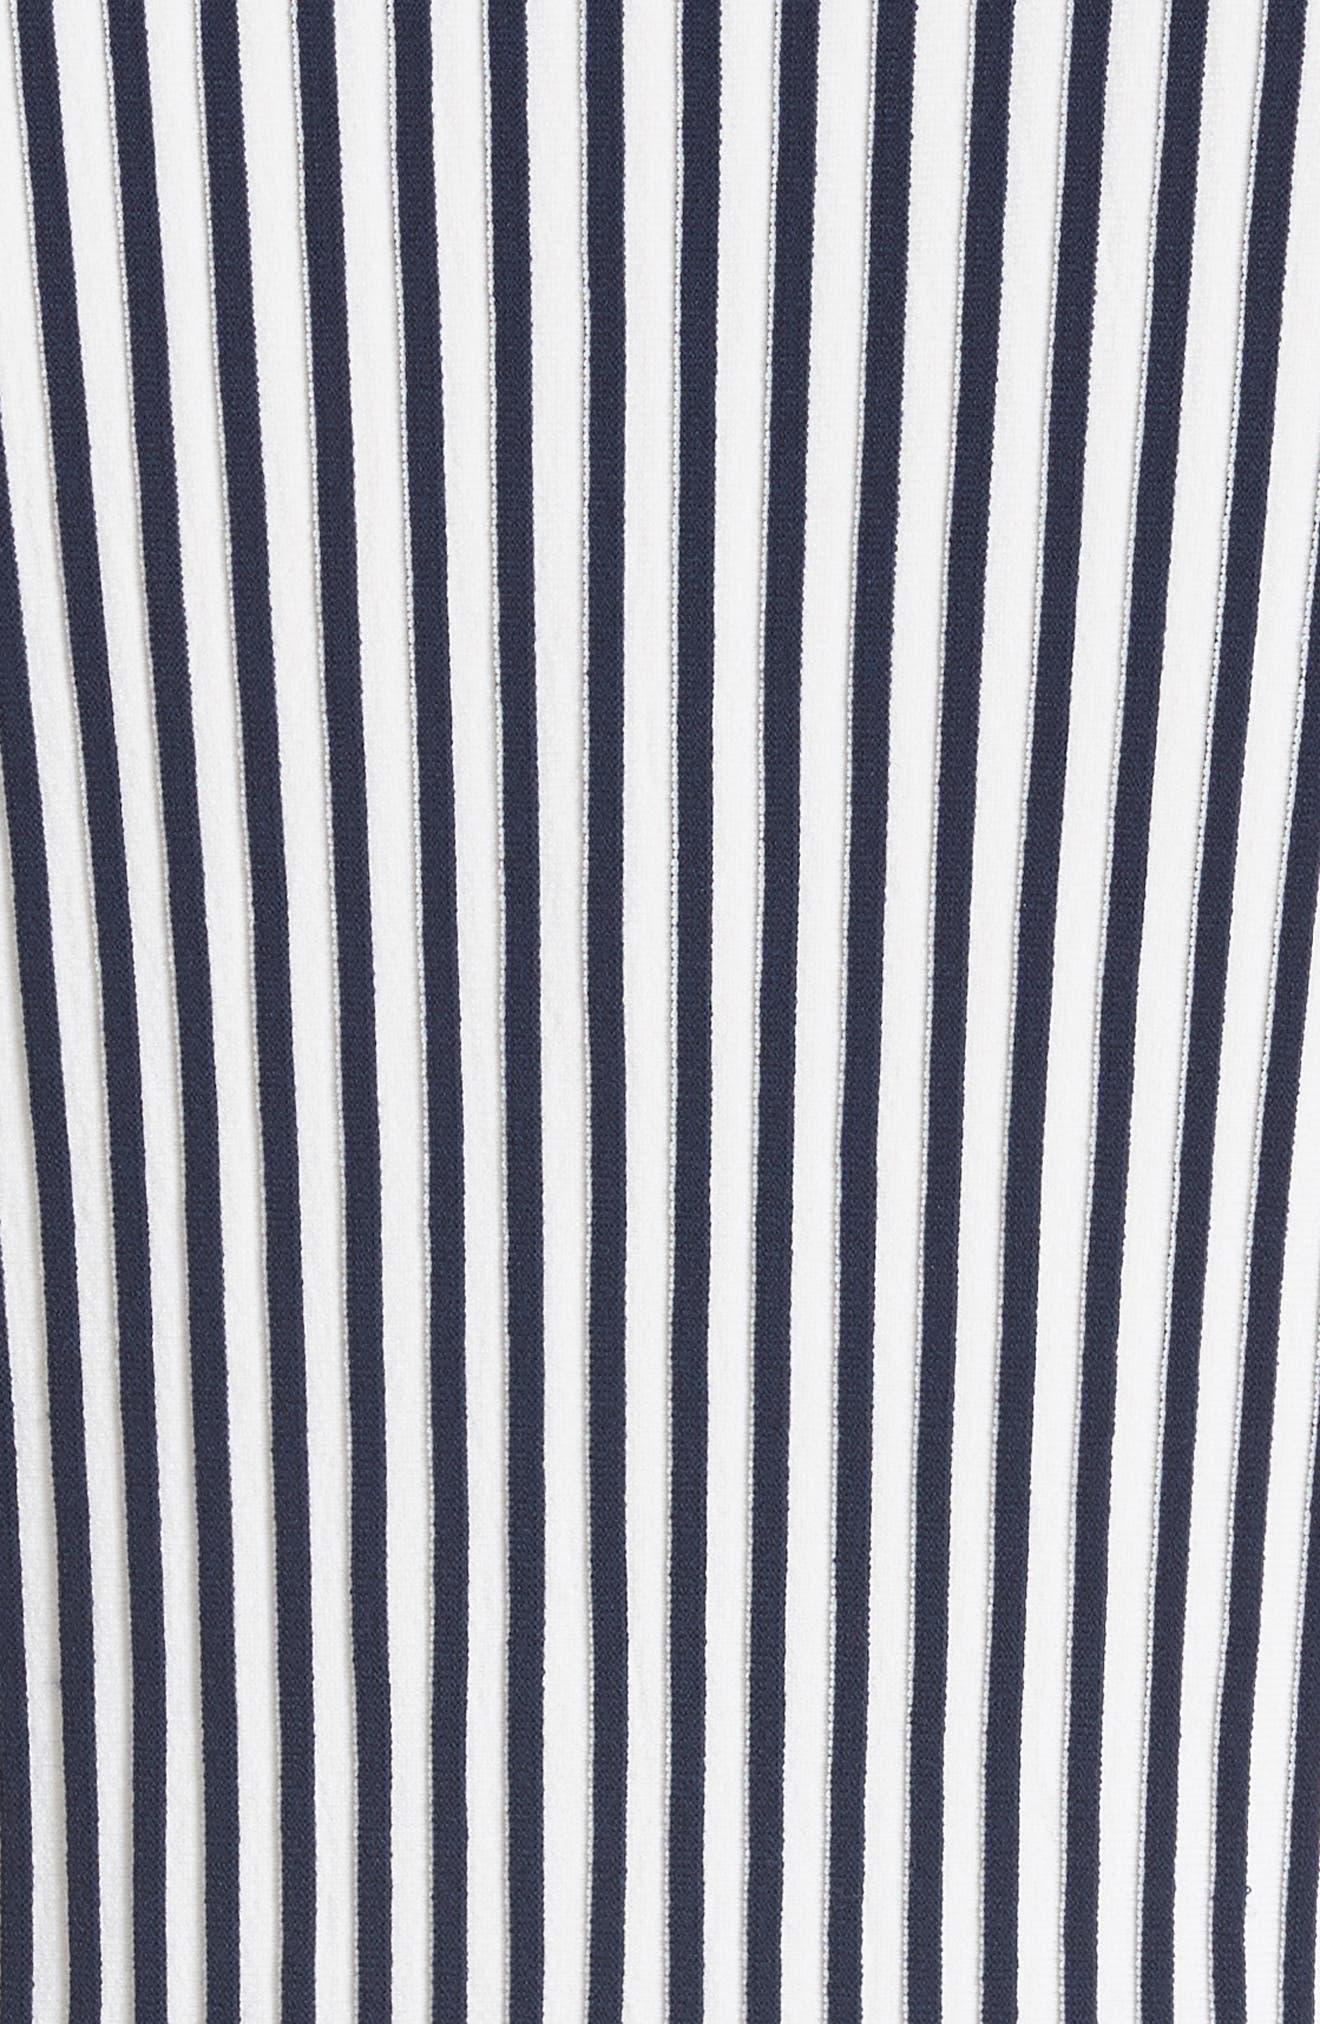 Stripe Knit Day Dress,                             Alternate thumbnail 5, color,                             453